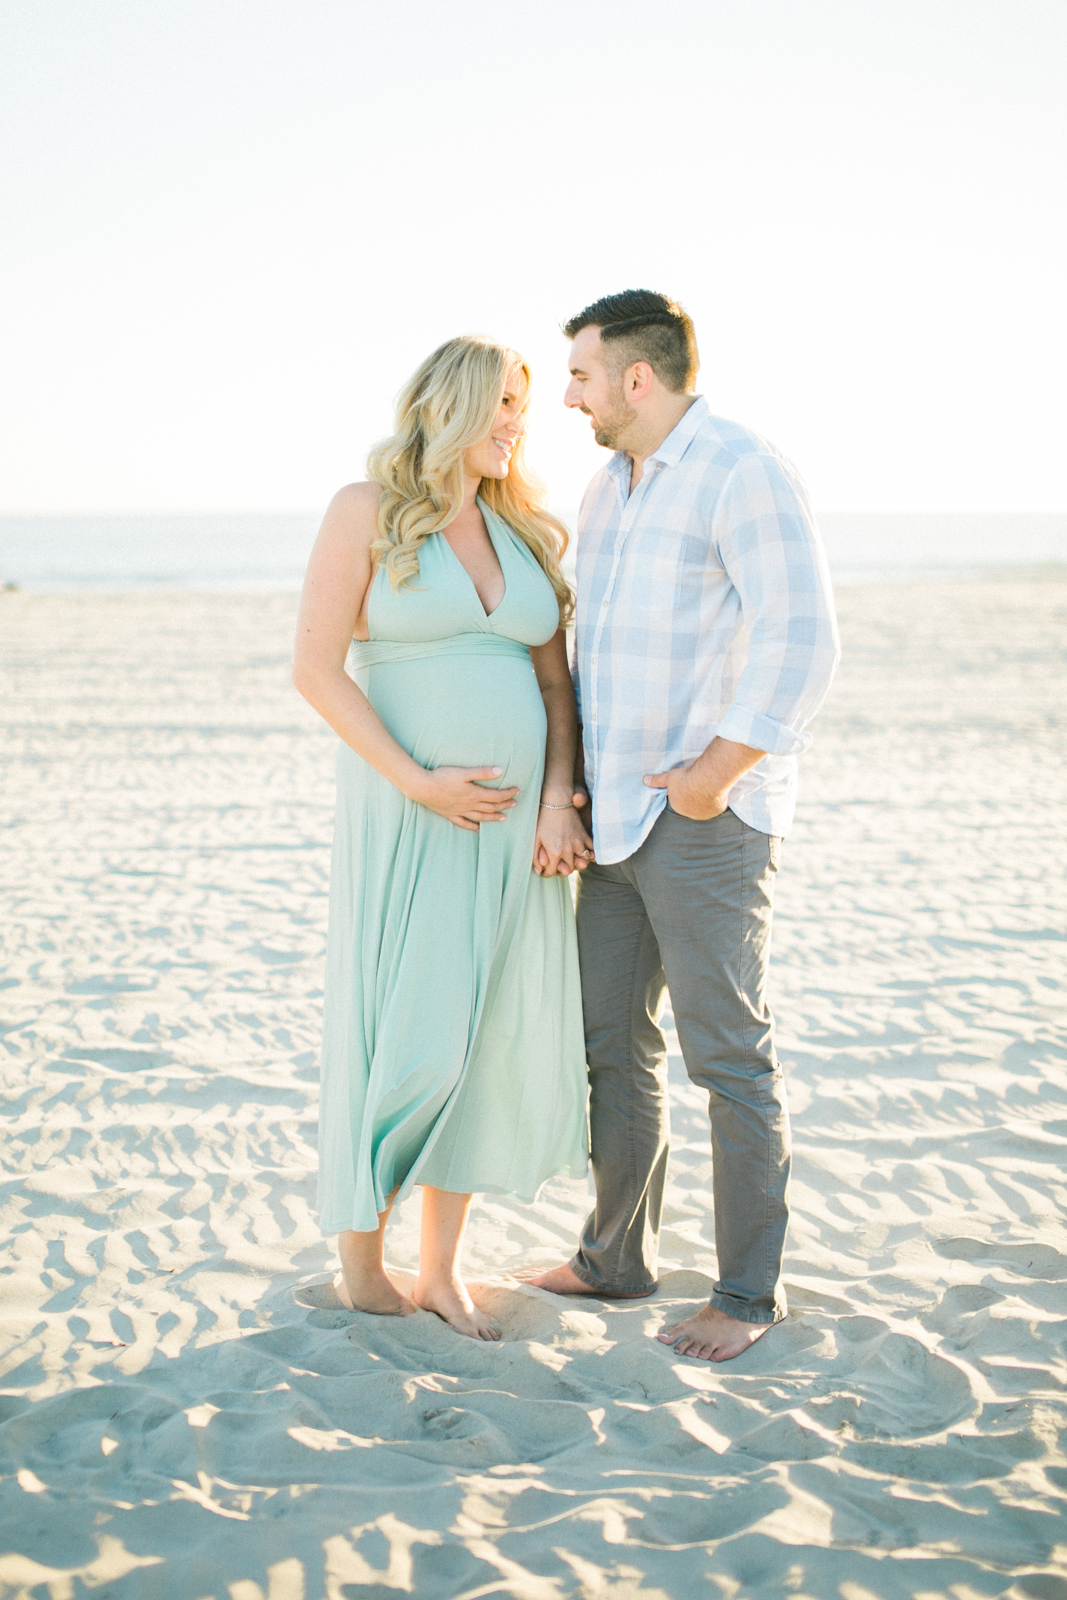 coronado-maternity-photos-7.jpg